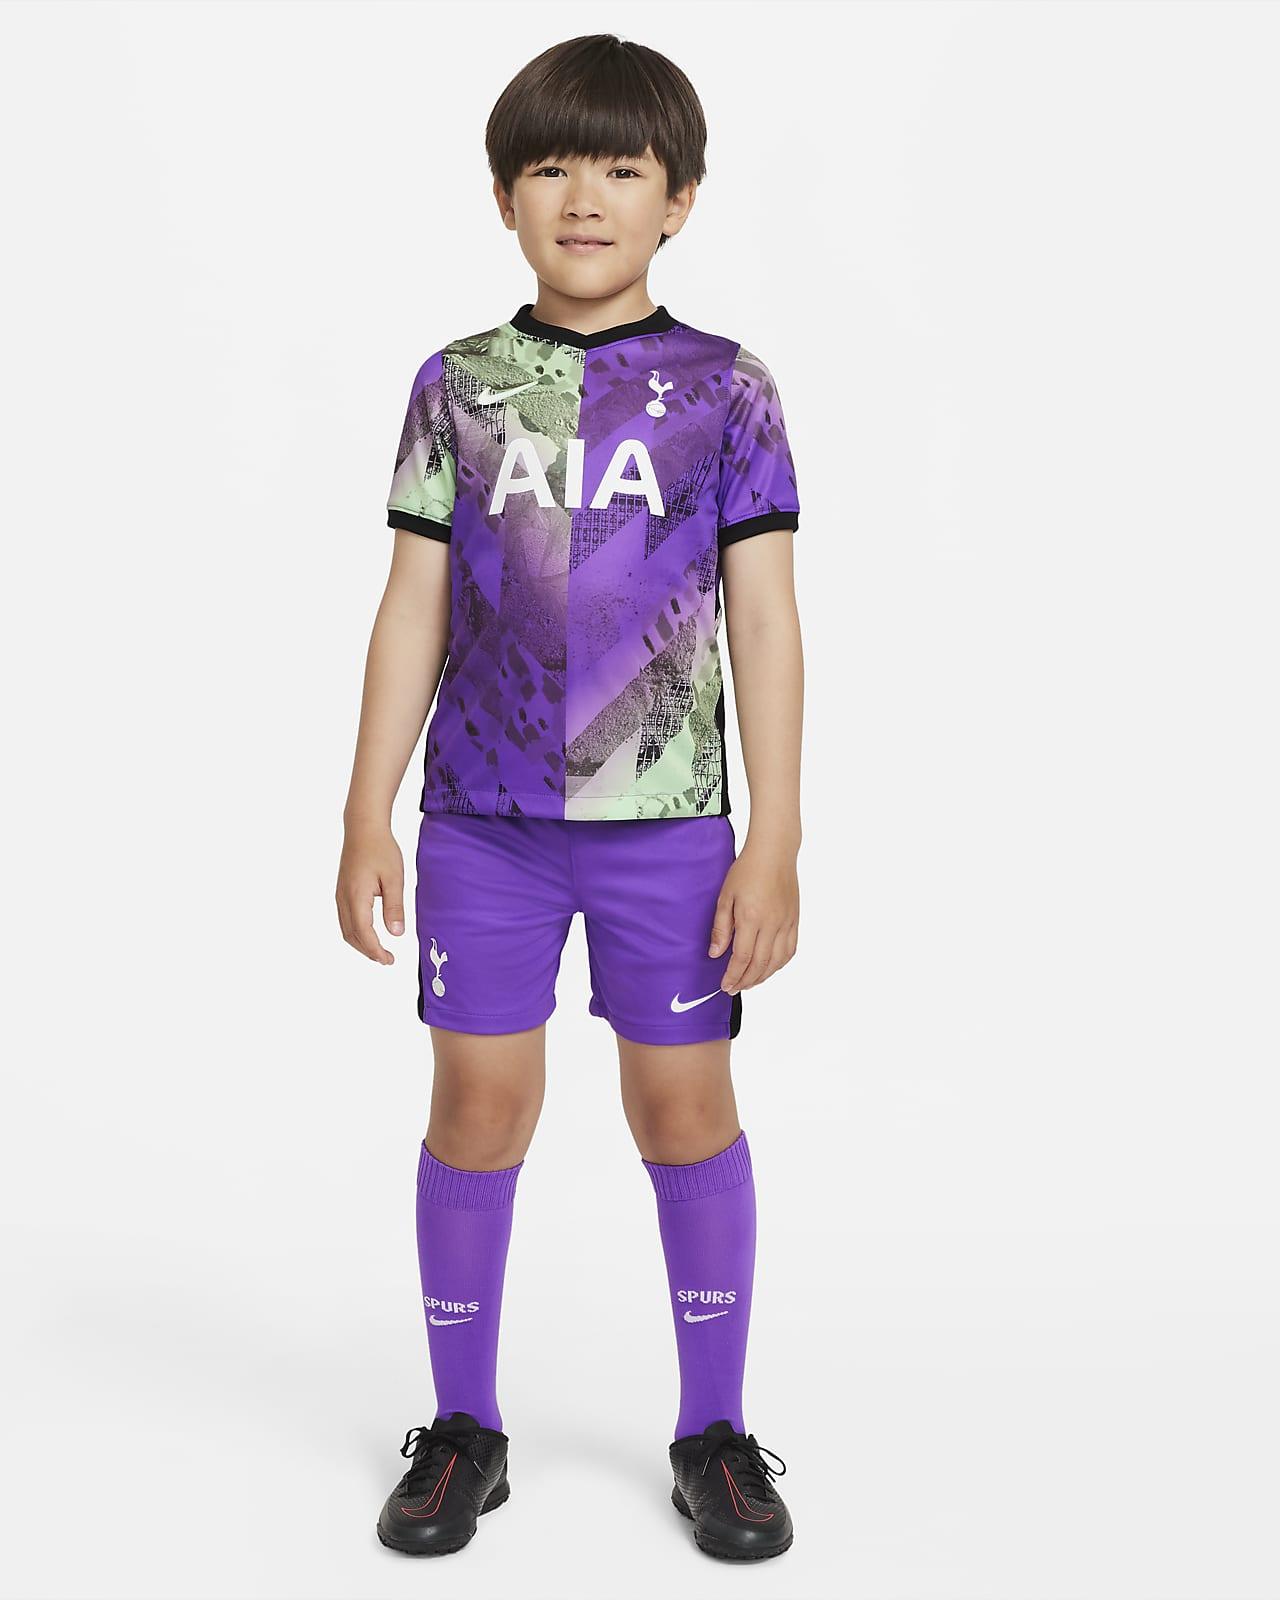 3e tenue de football Nike Dri-FIT Tottenham Hotspur 2021/22 pour Jeune enfant